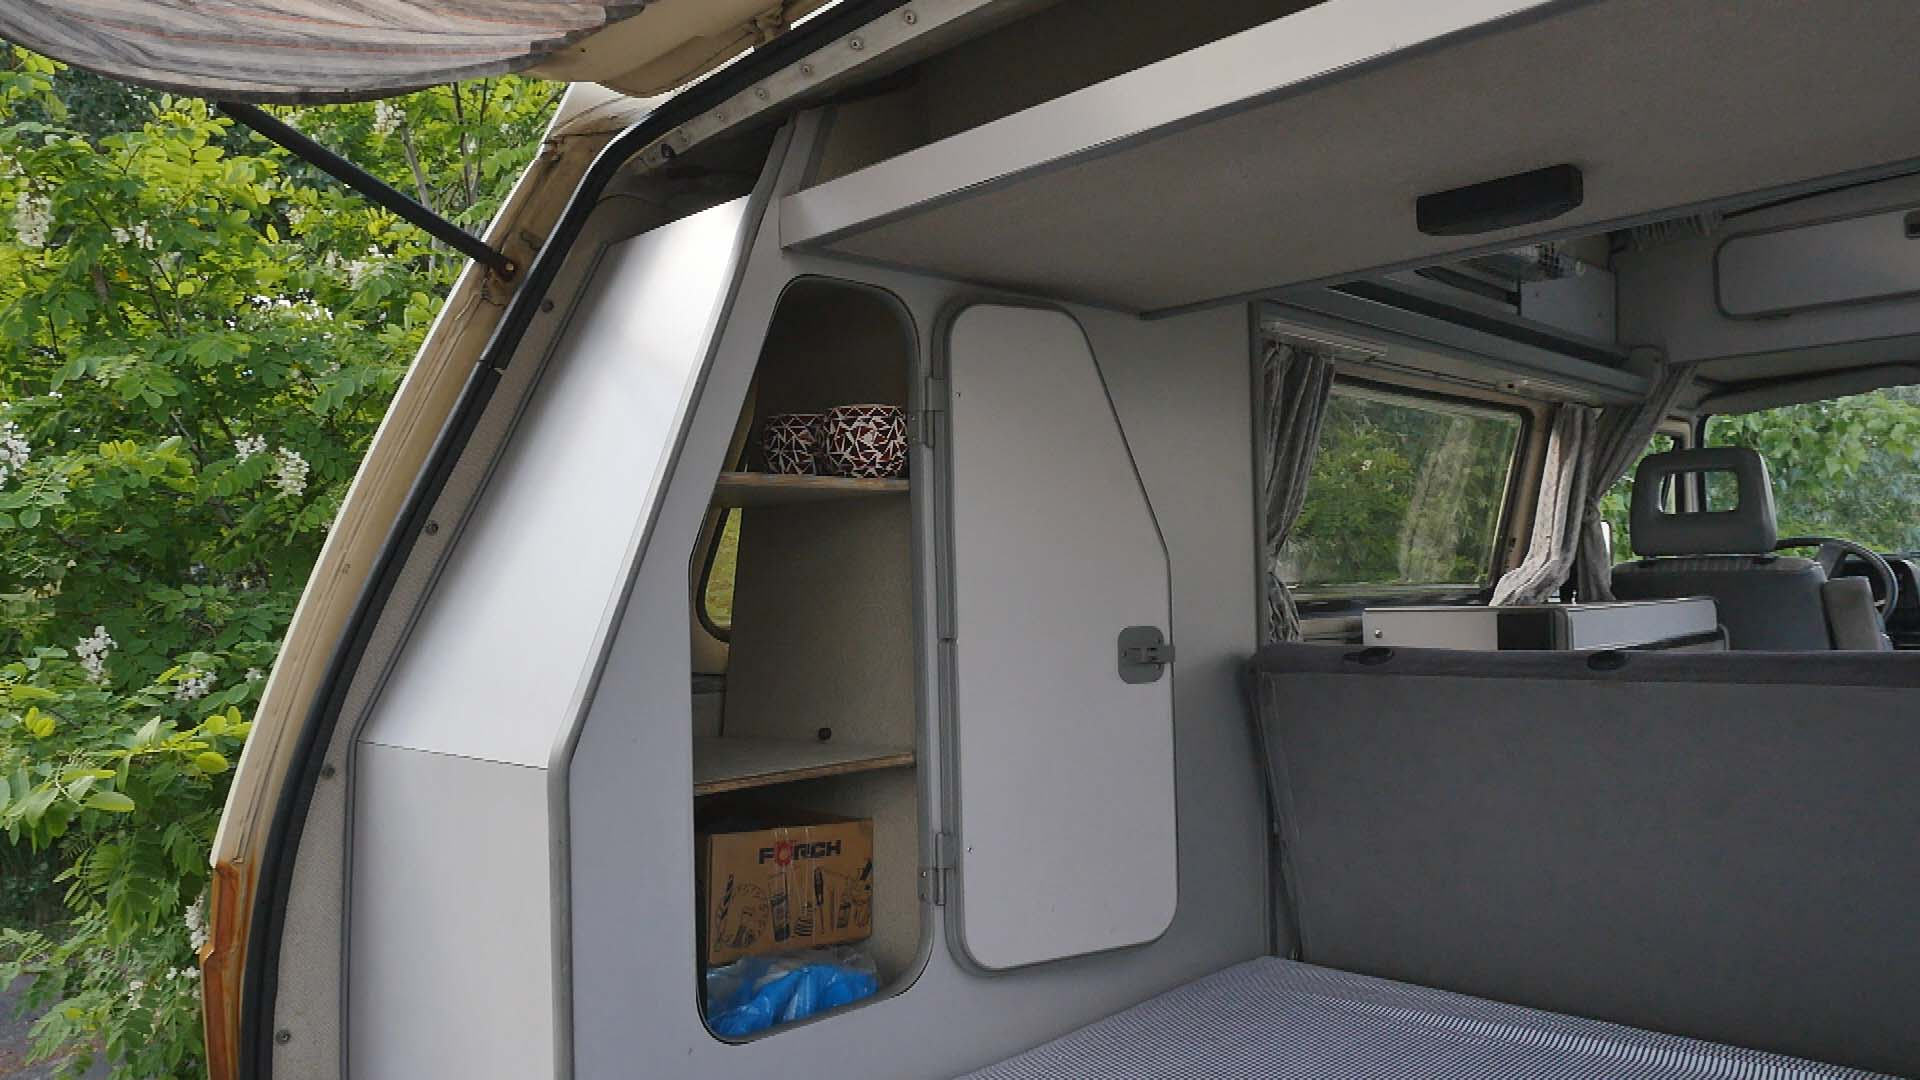 BulliHoliday VW Bulli mieten Kuno - Fahrerkabine